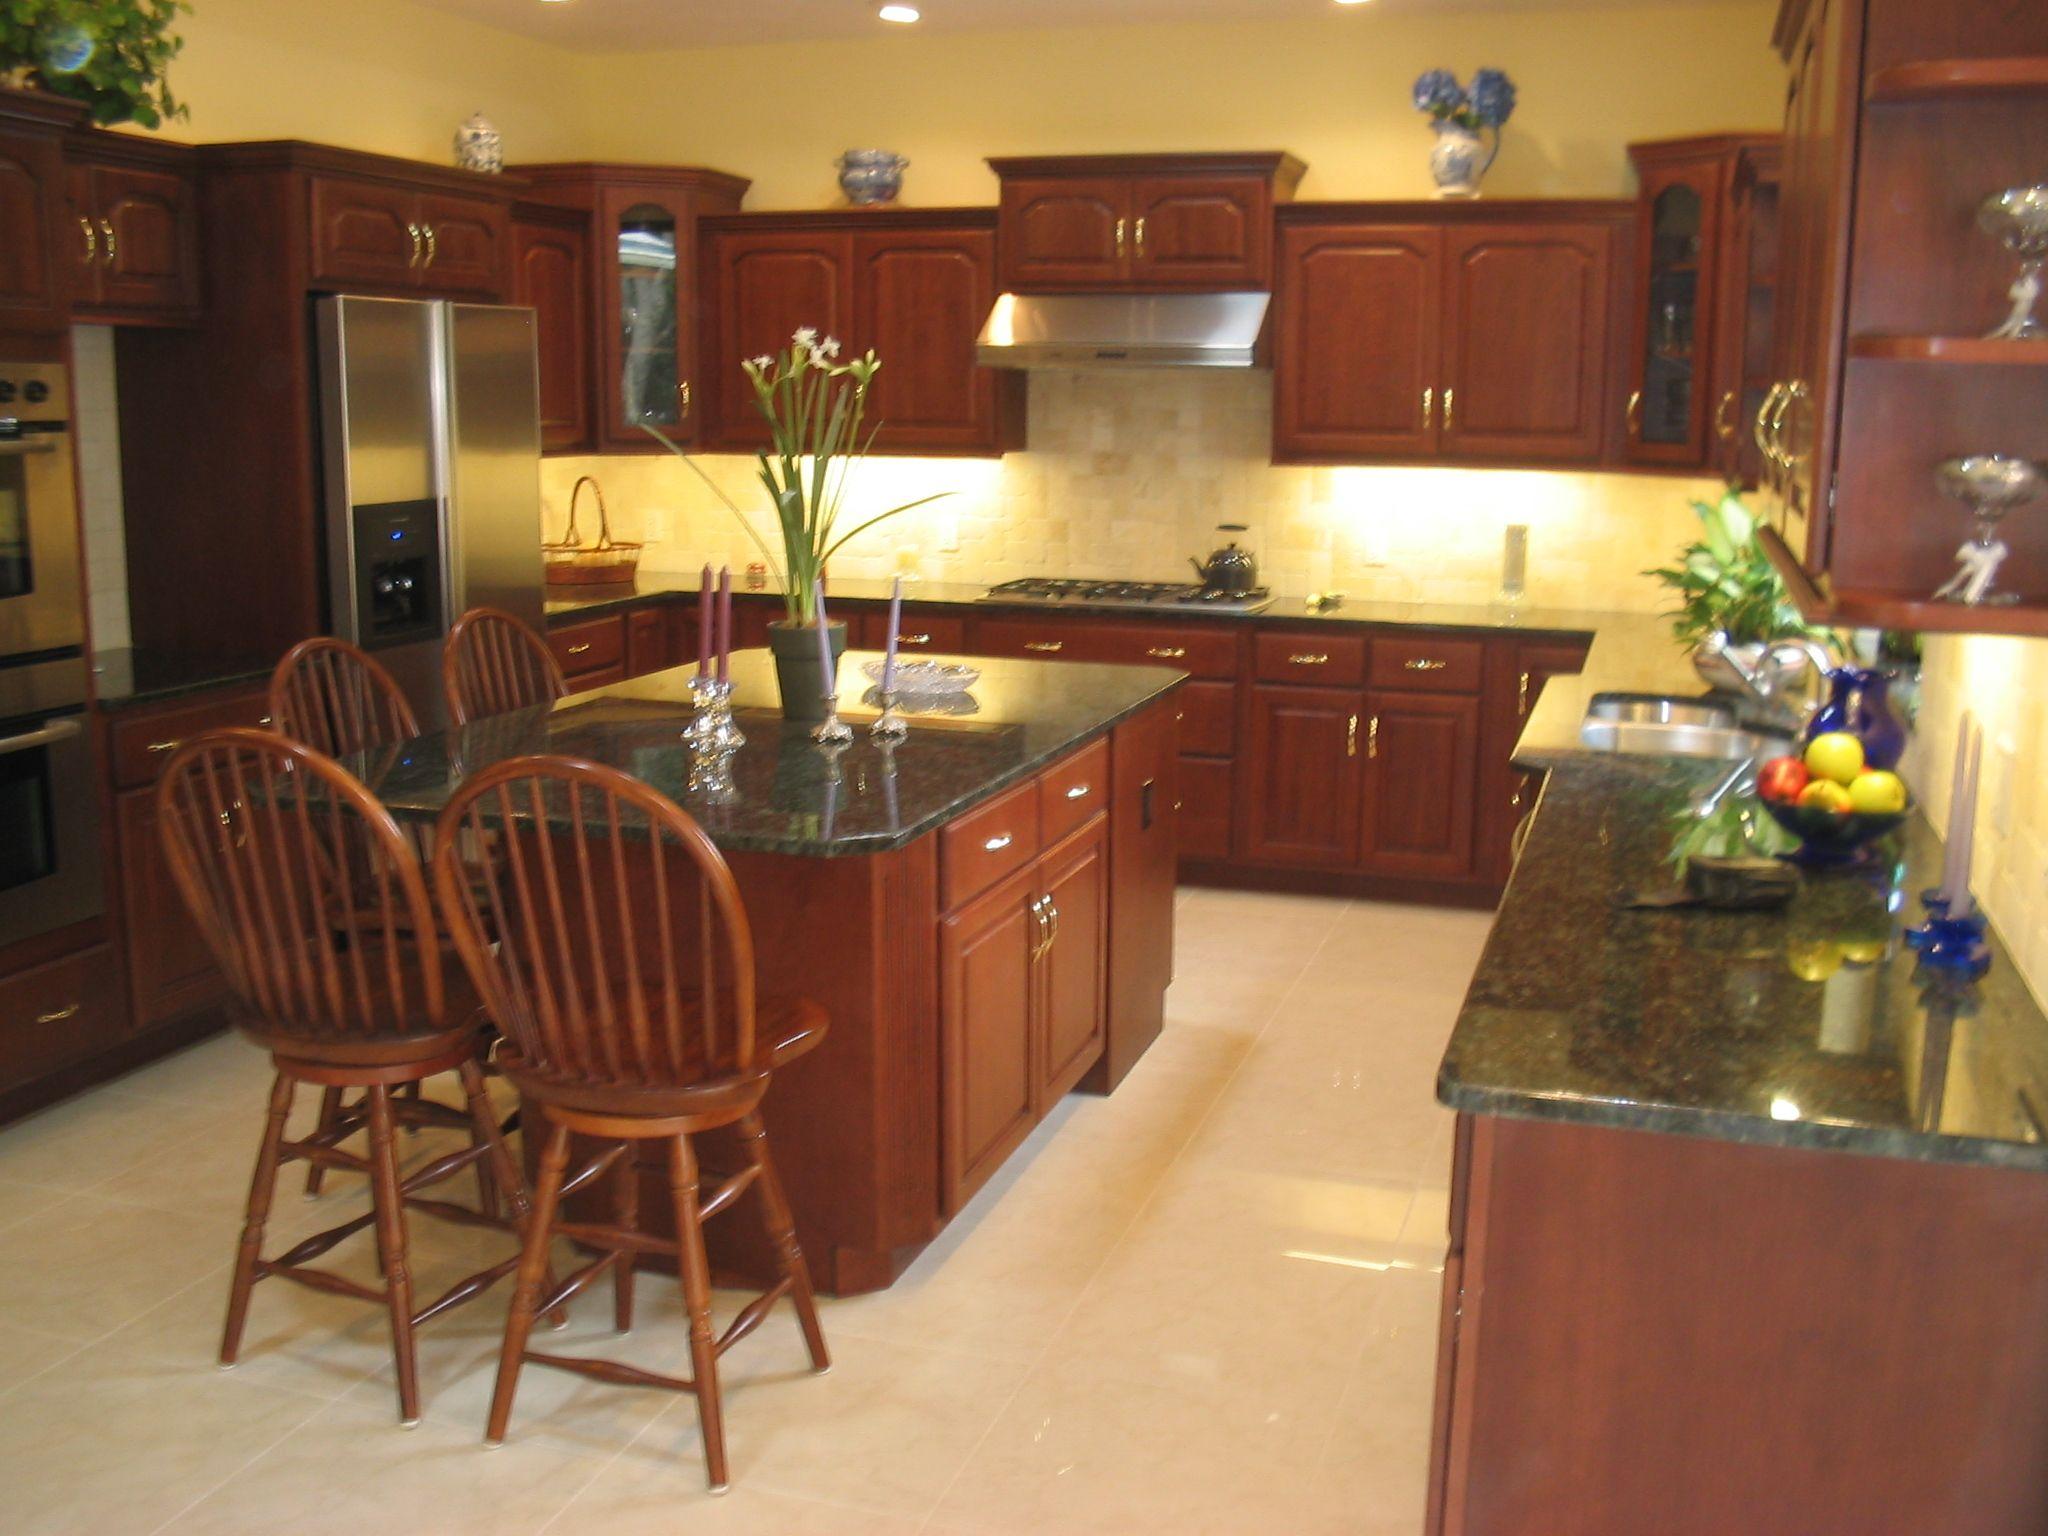 cherry kitchen cabinets | Cherry Kitchen has Rutledge Door ...